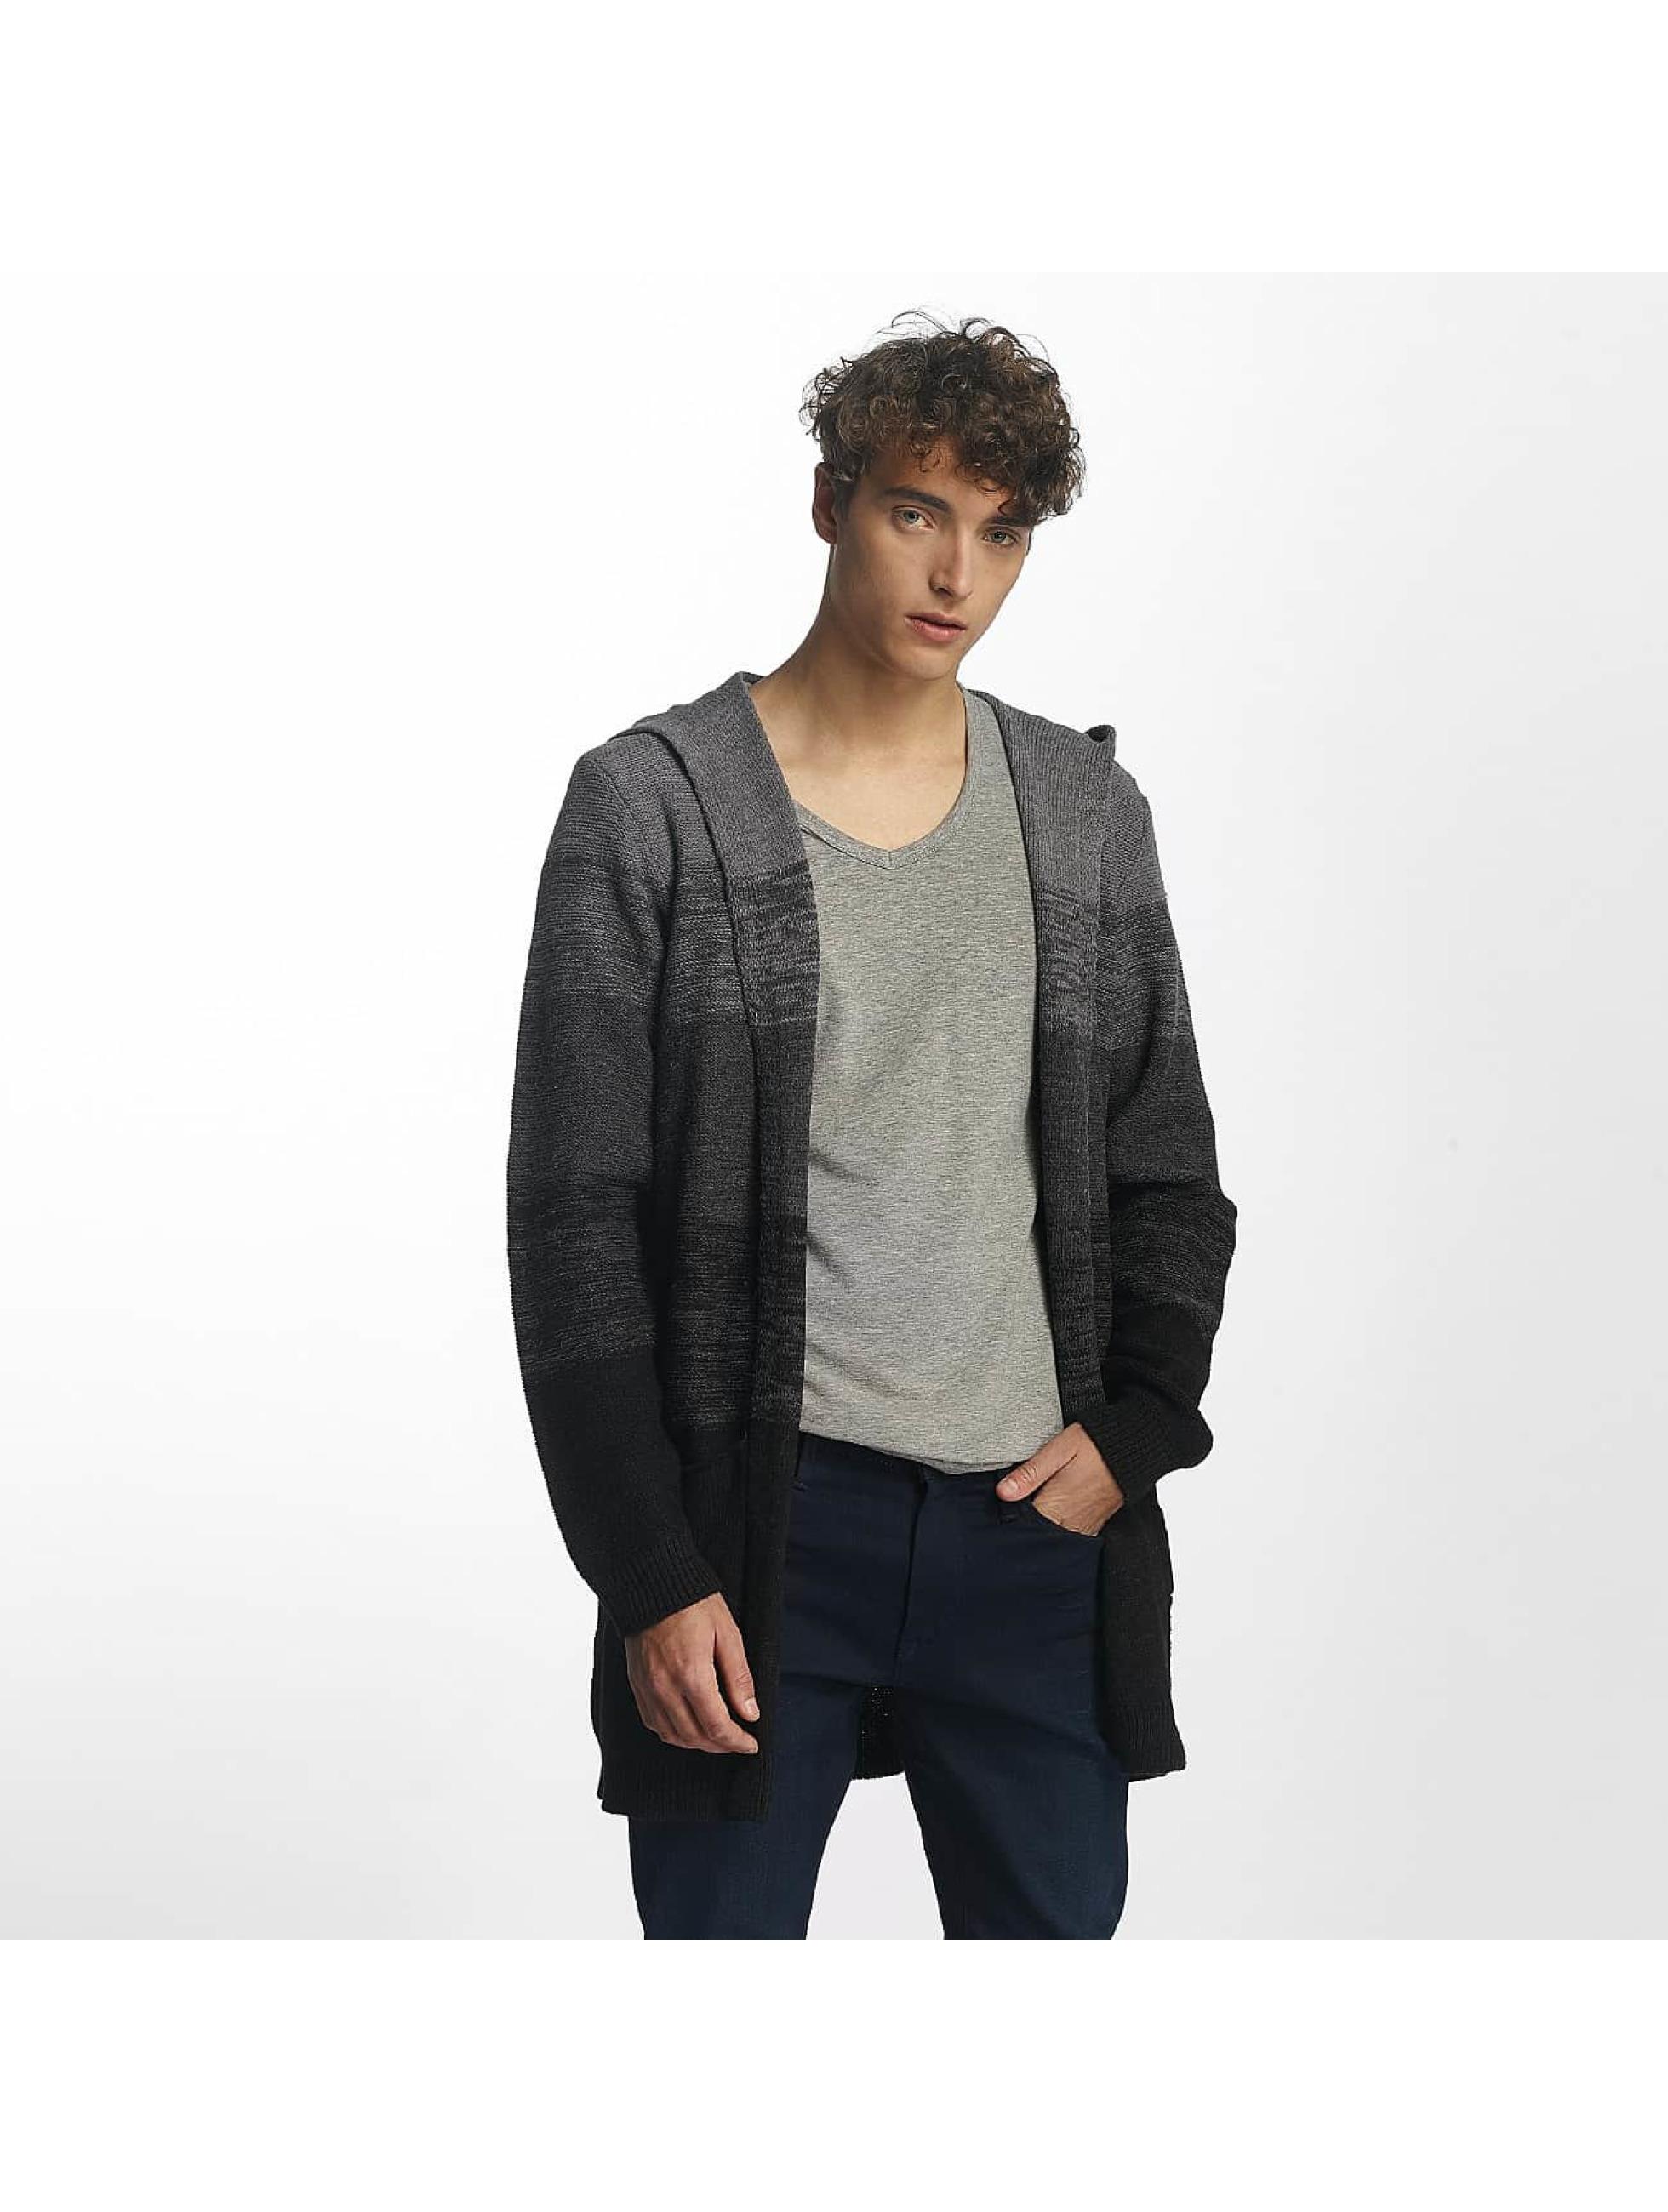 Mavi Jeans Männer Strickjacke Hoody Cardigan in schwarz